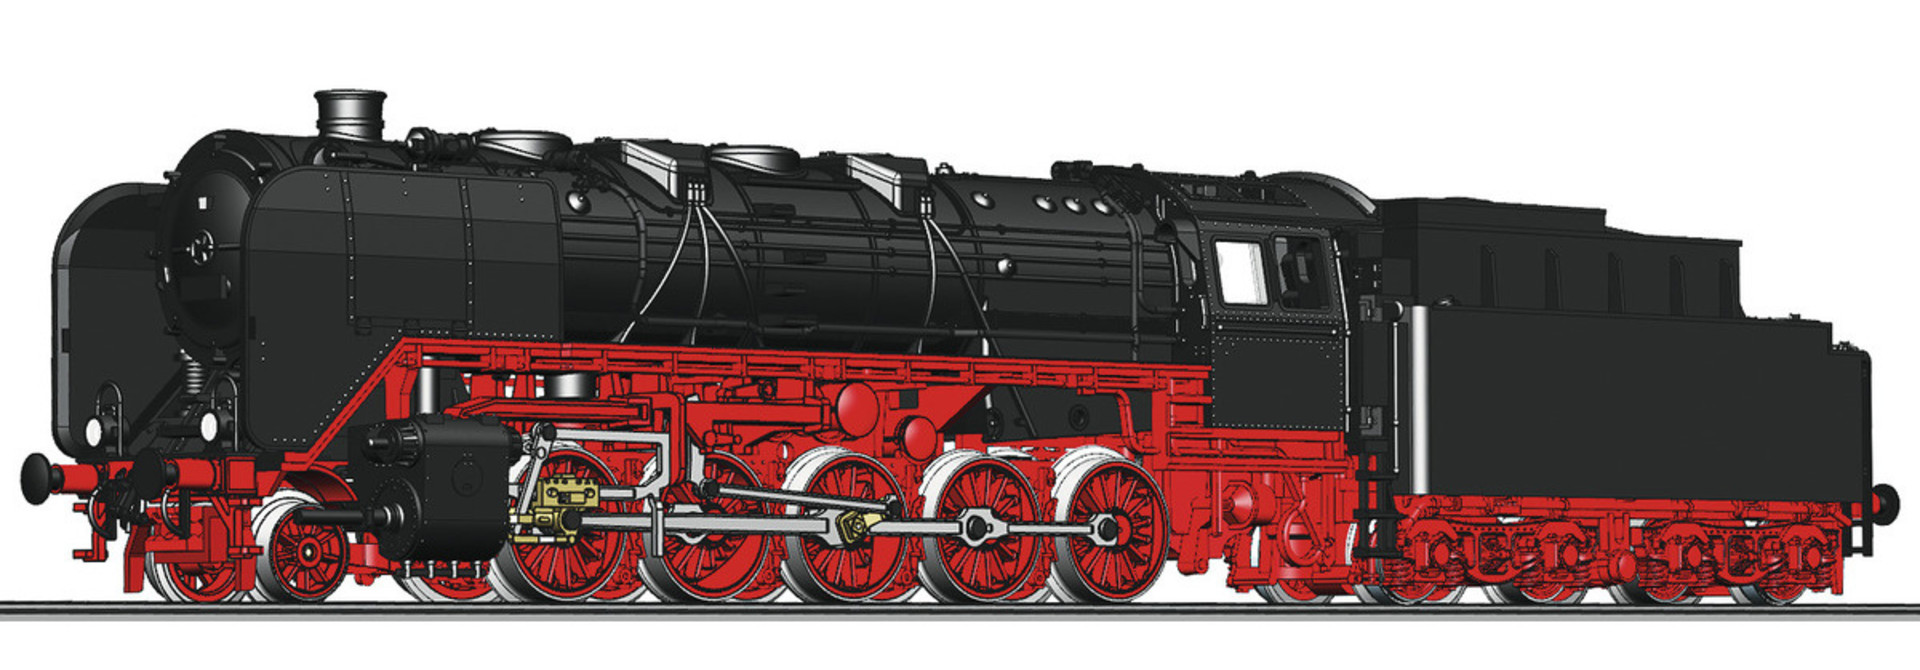 714403 Dampflok BR 44. DRG